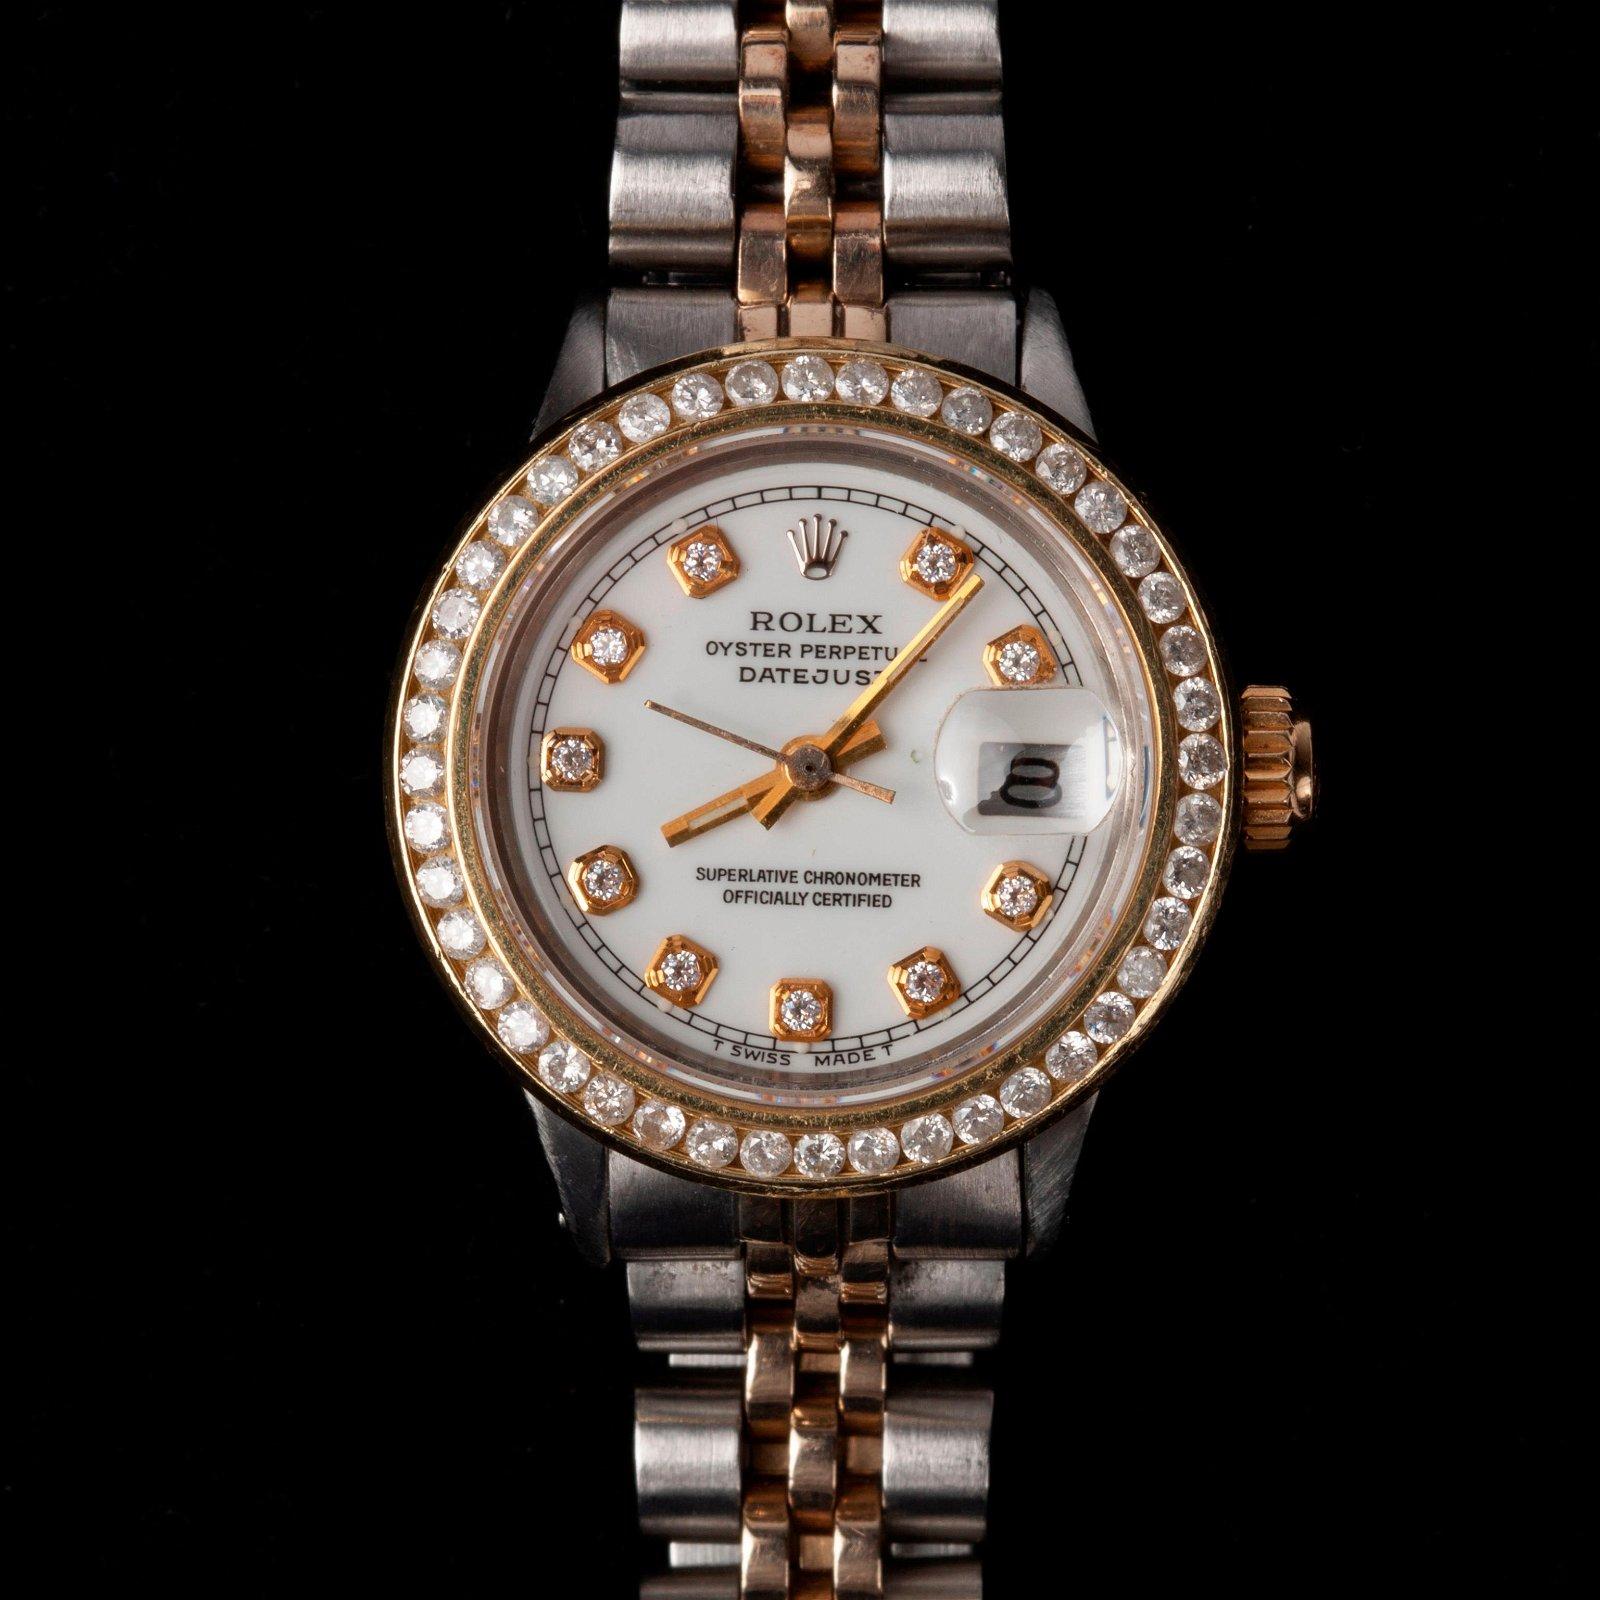 Rolex Oyster Perpetual DateJust Watch w/ Diamonds #6517